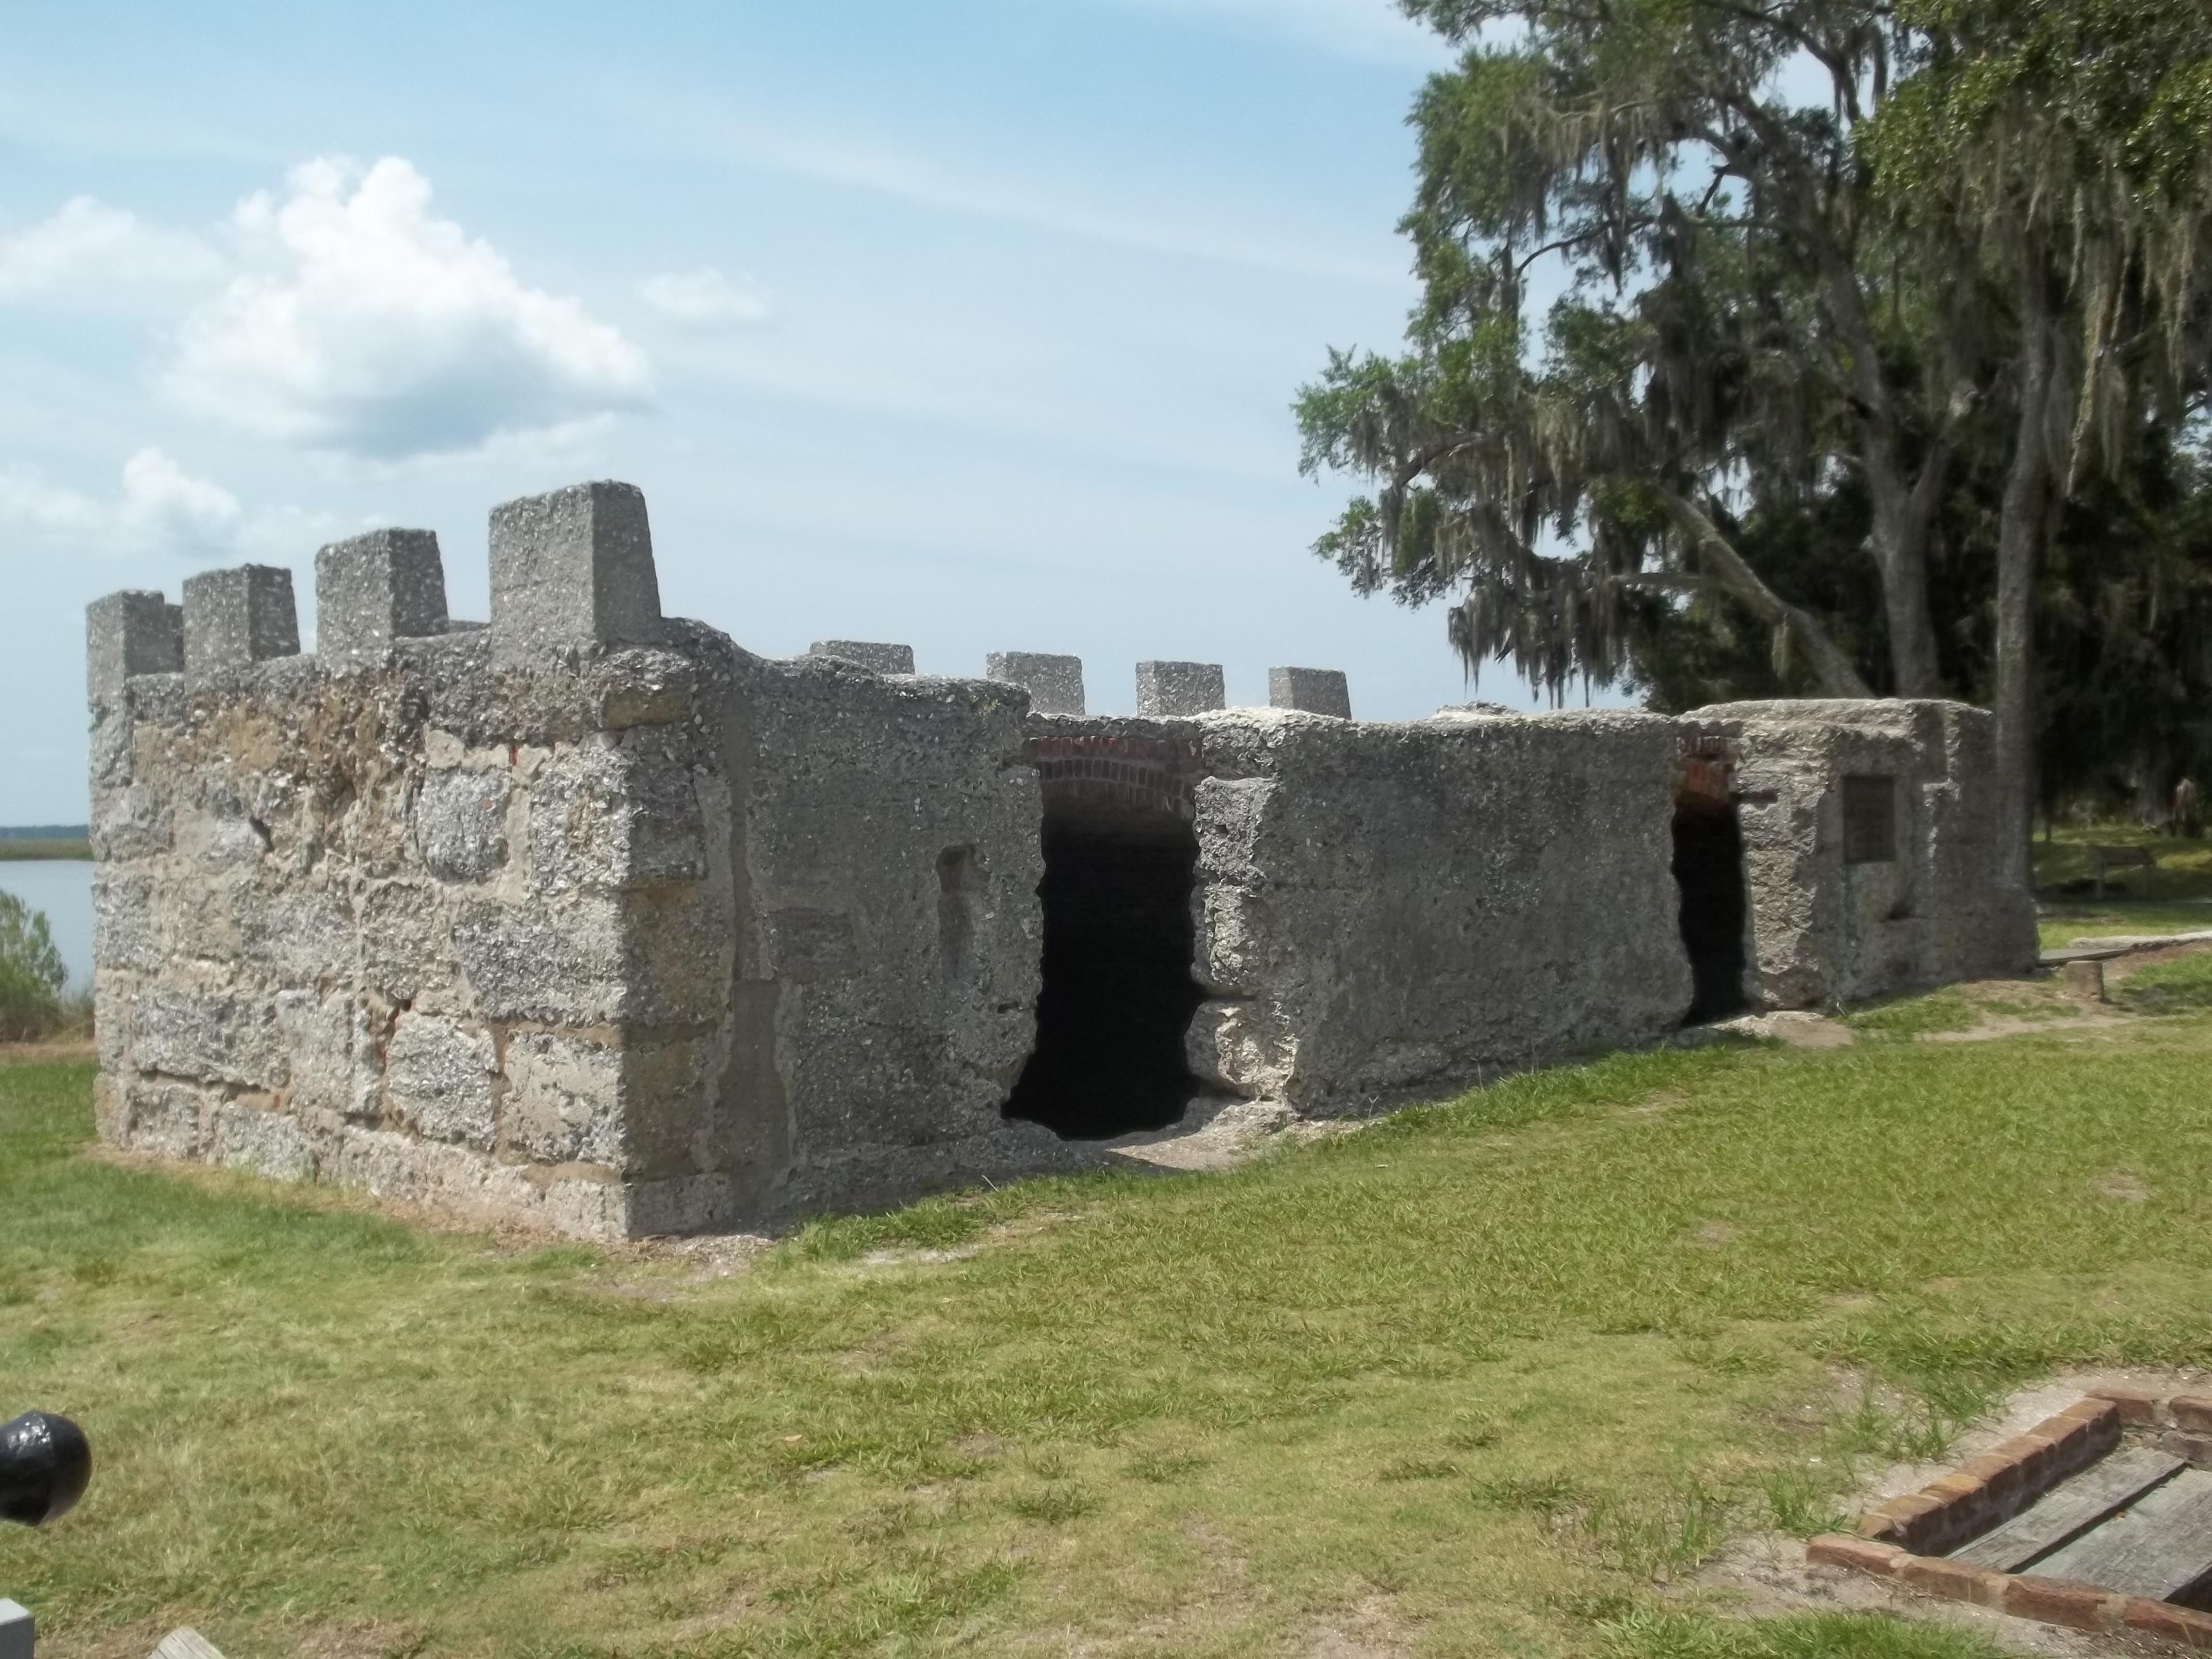 St Simons Island Forts